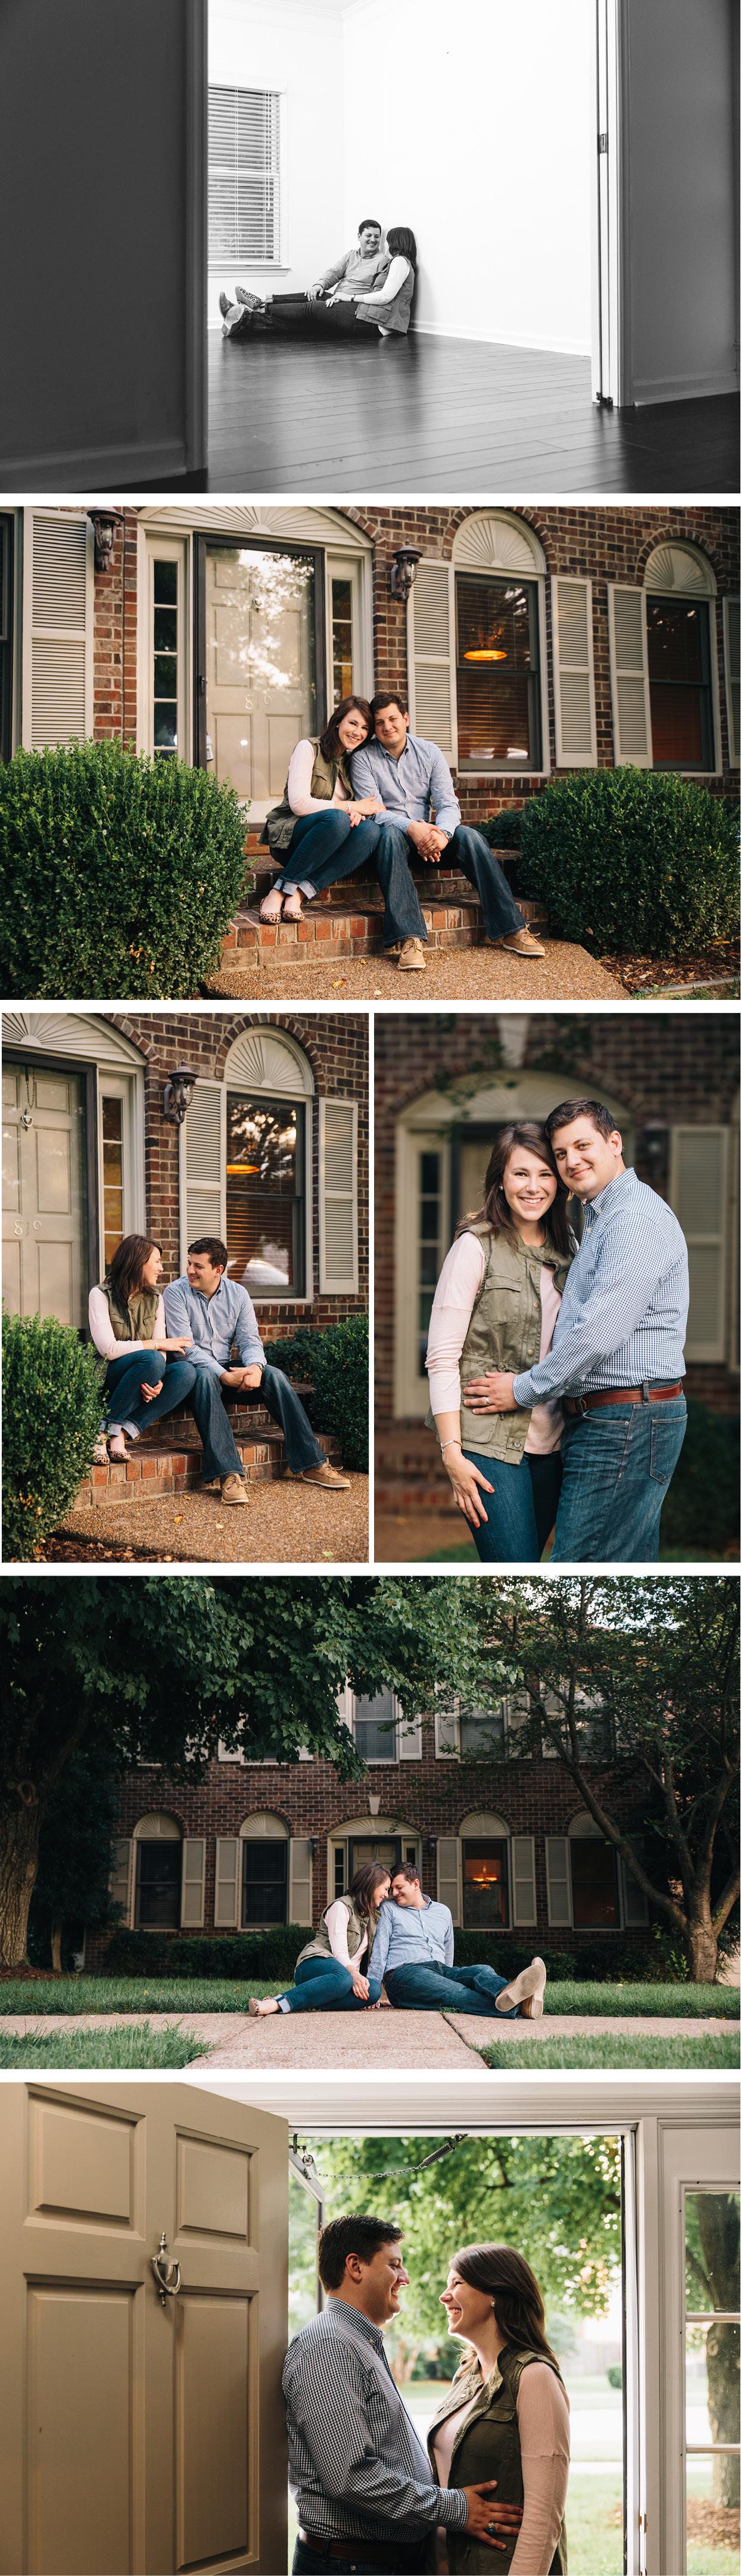 CK-Photo-Nashville-Lifestyle-Photographer-re2.jpg